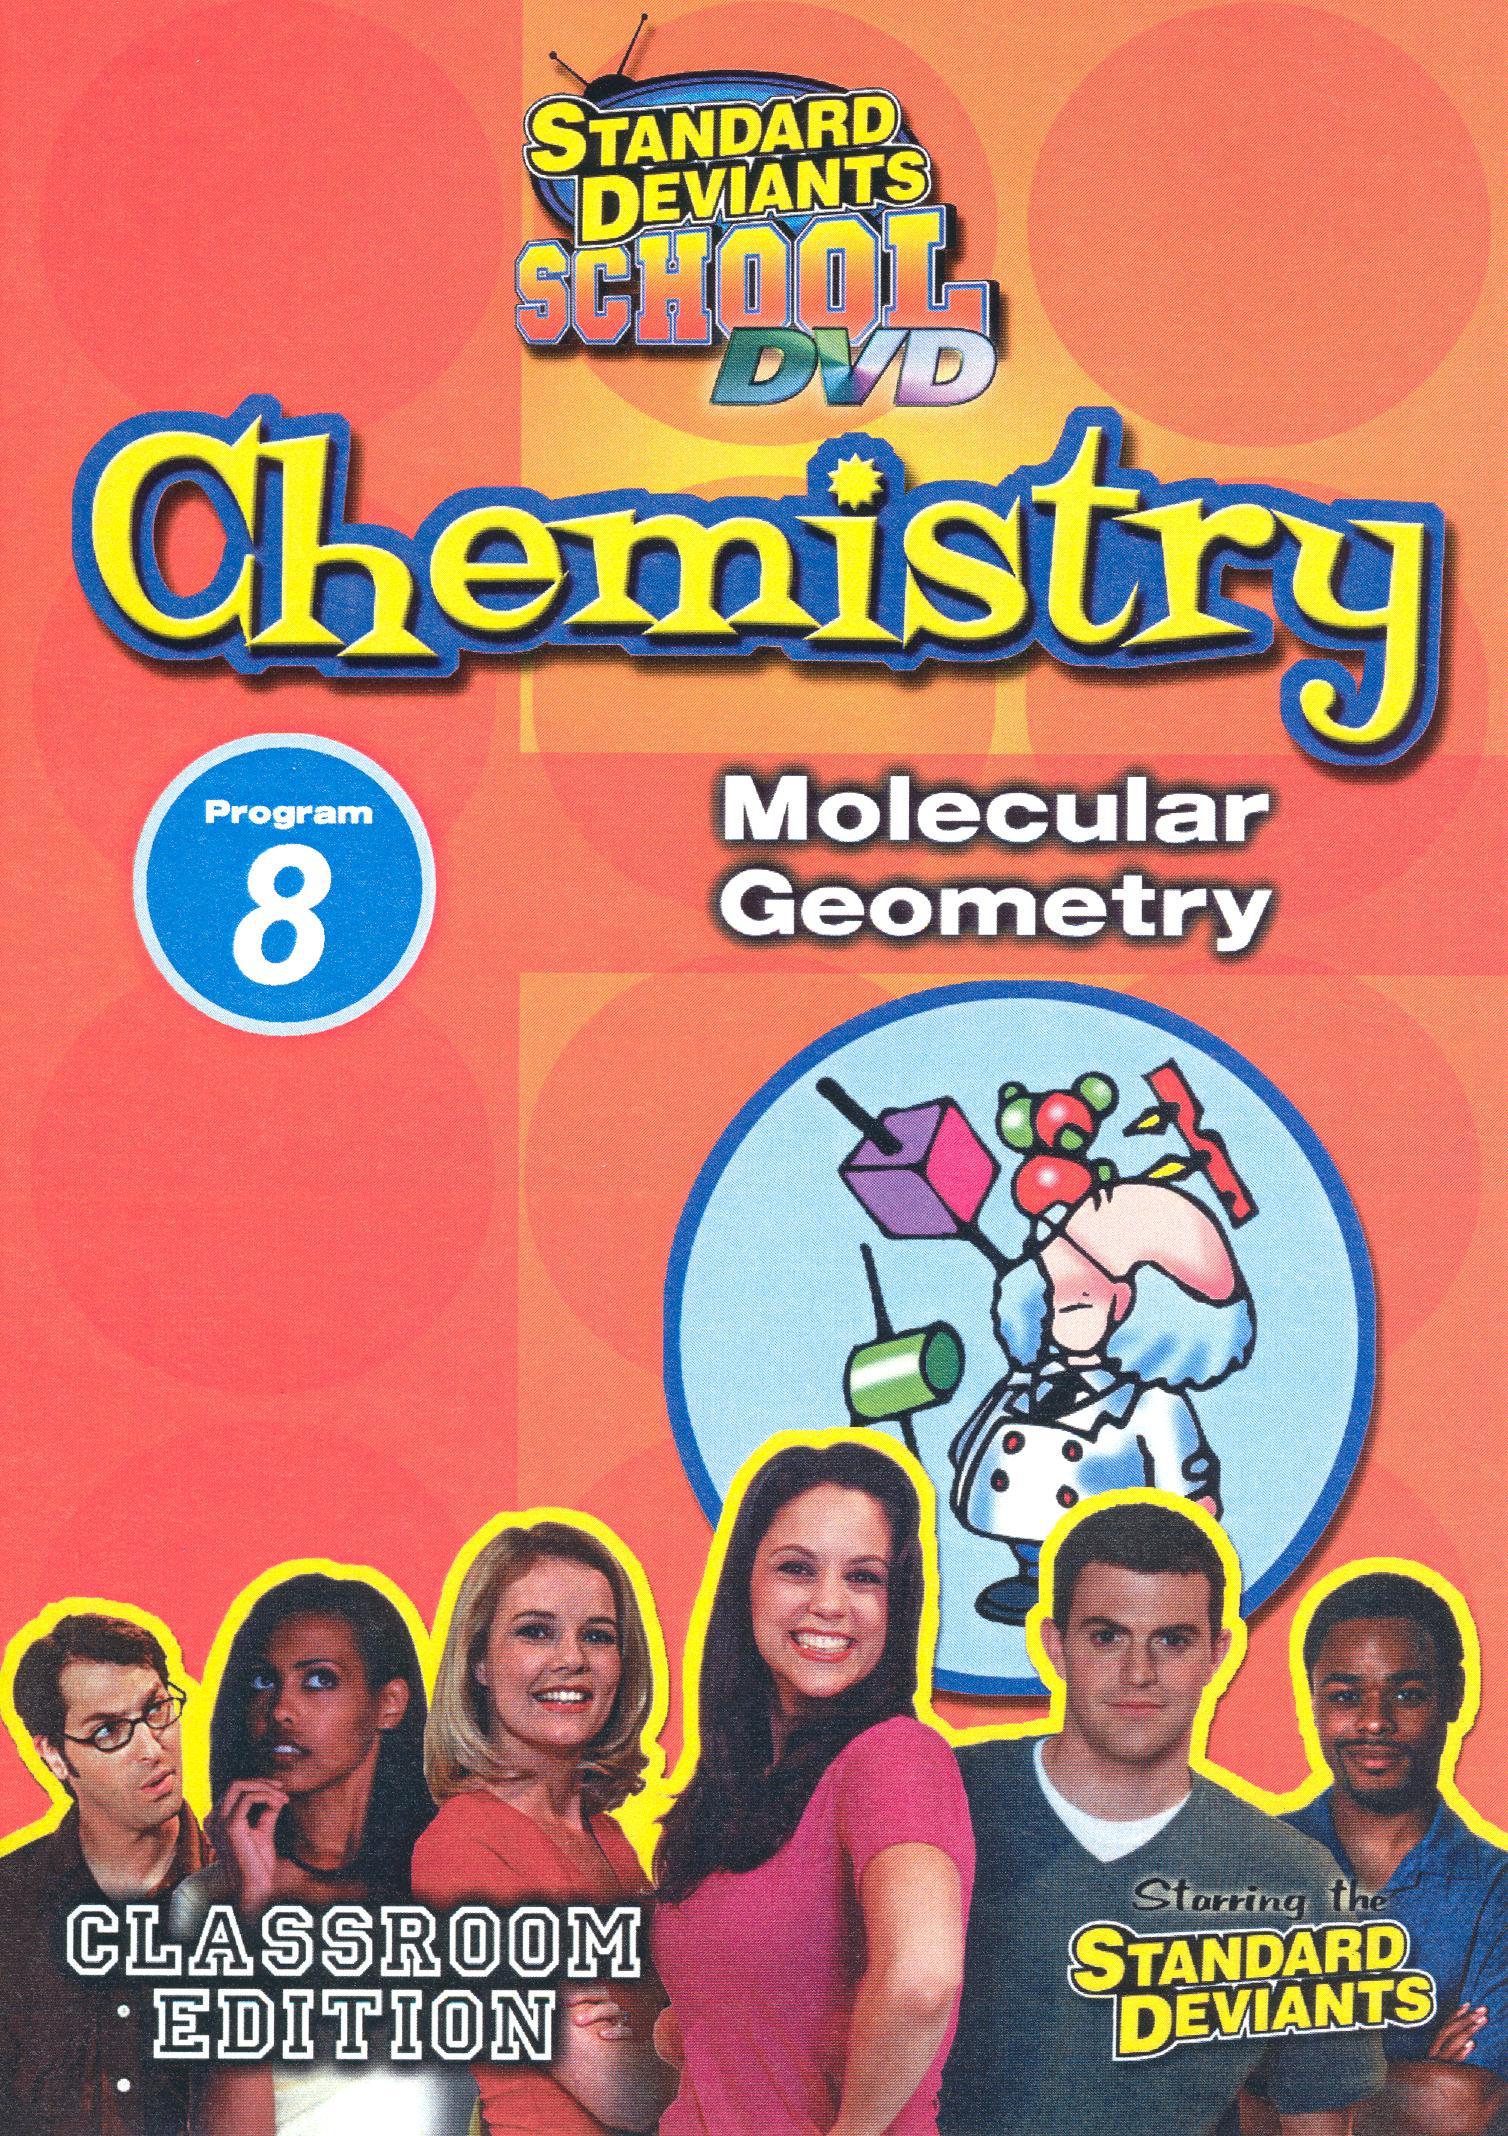 Standard Deviants School: Chemistry, Program 8